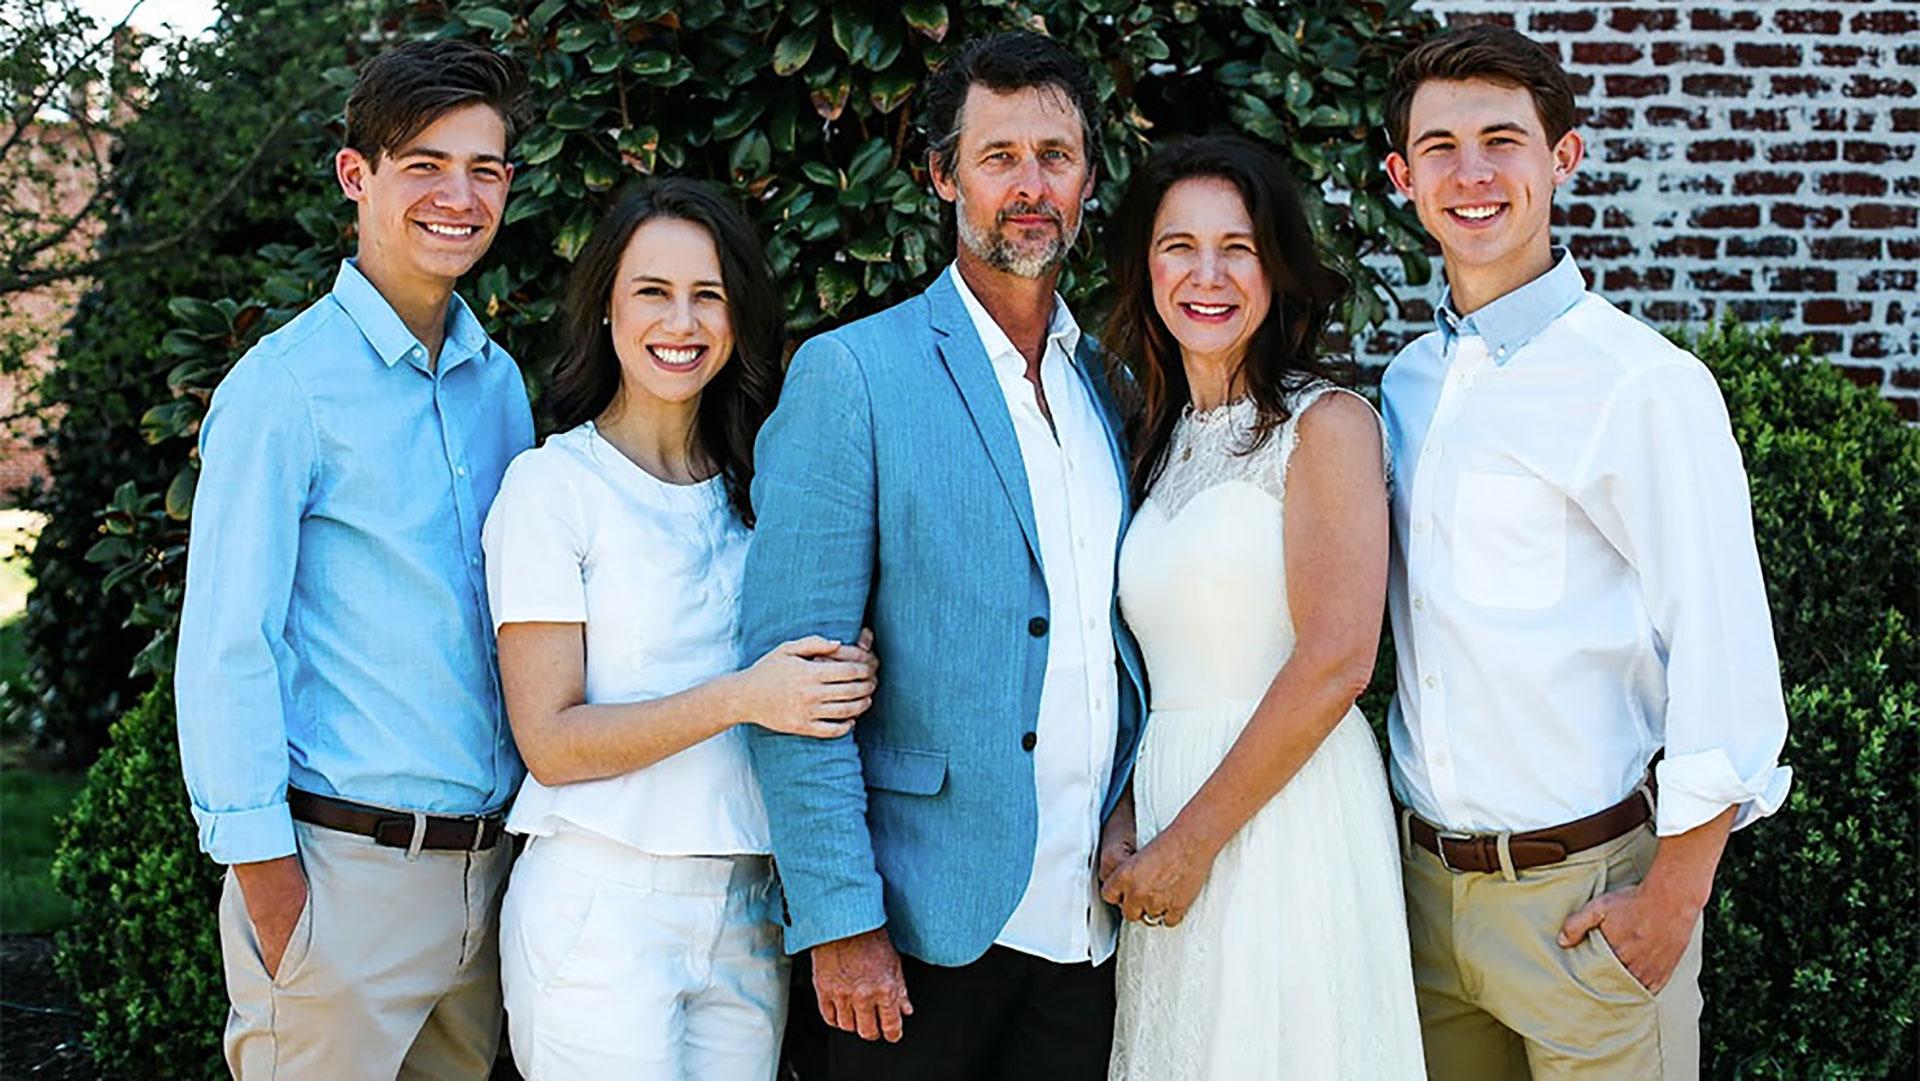 Jenni Mendl Family - Weigh Down Testimony